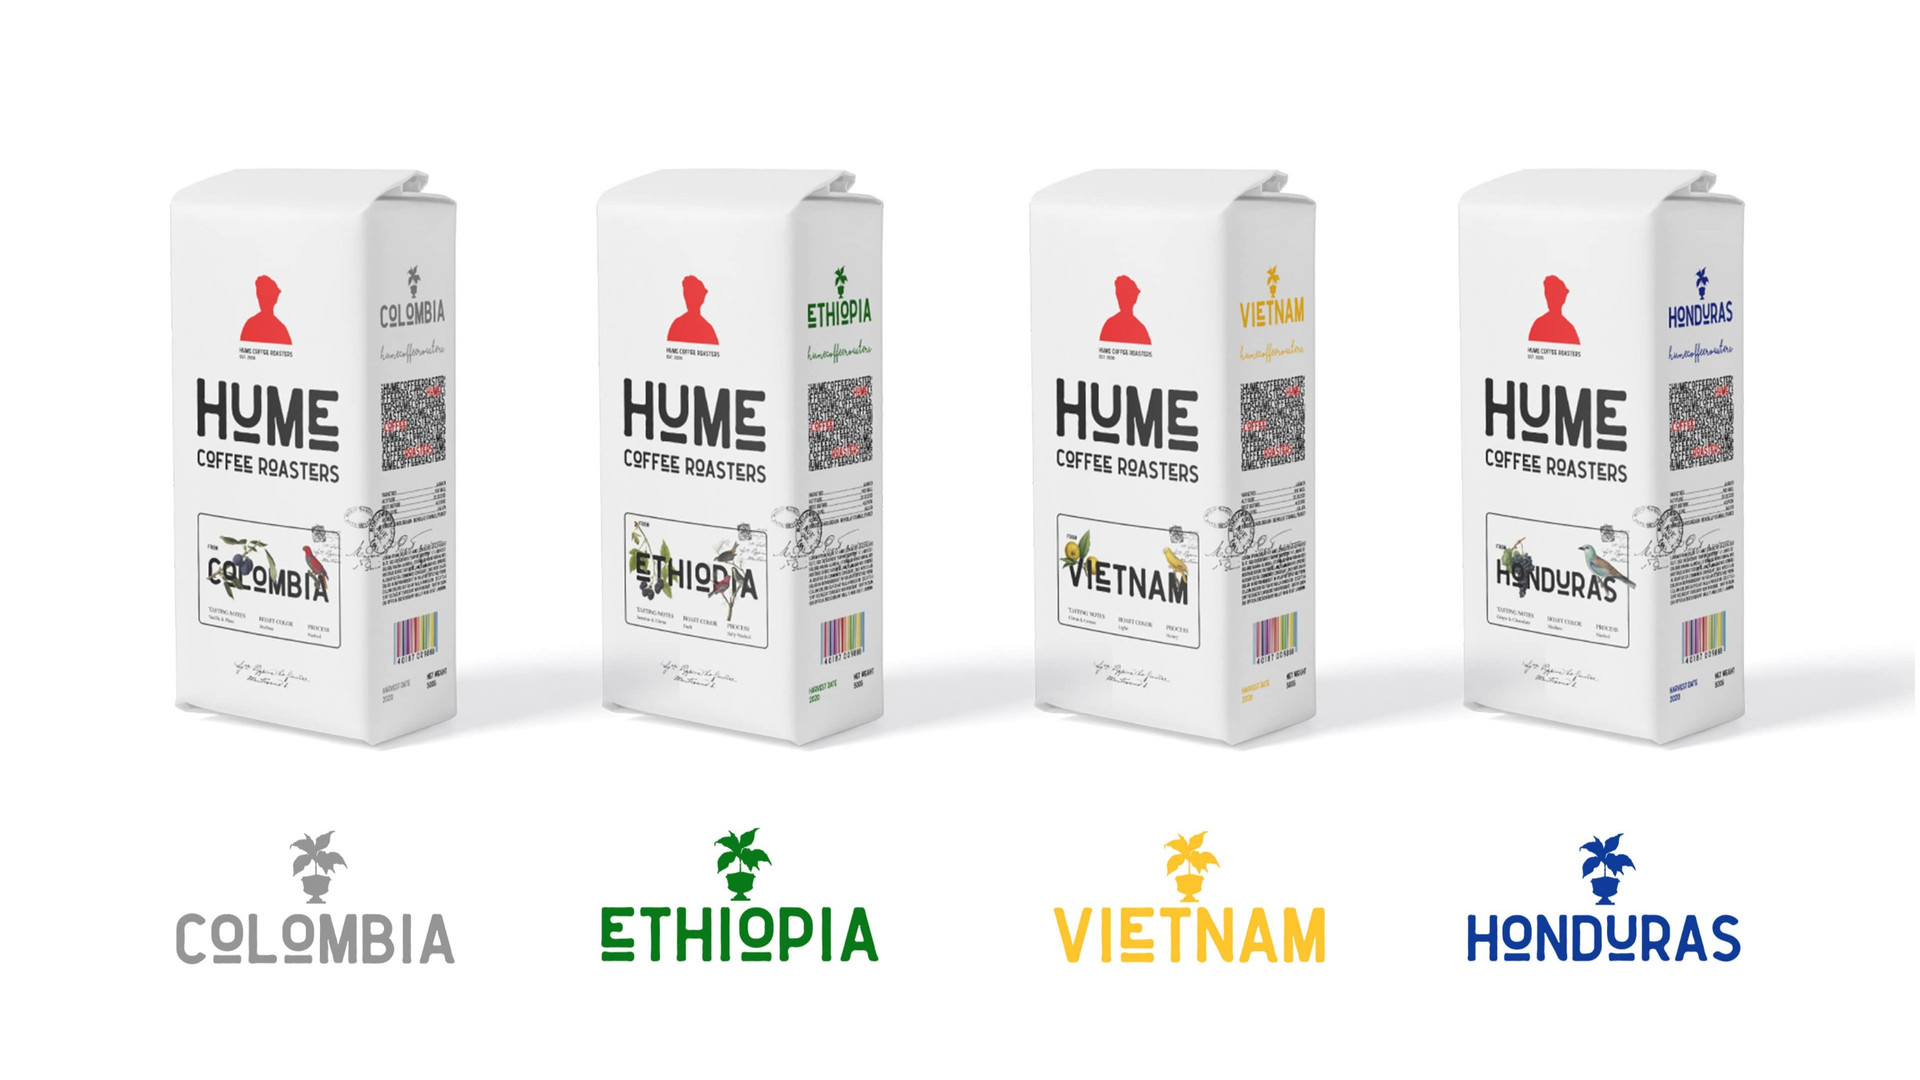 Hume Coffee Roasters